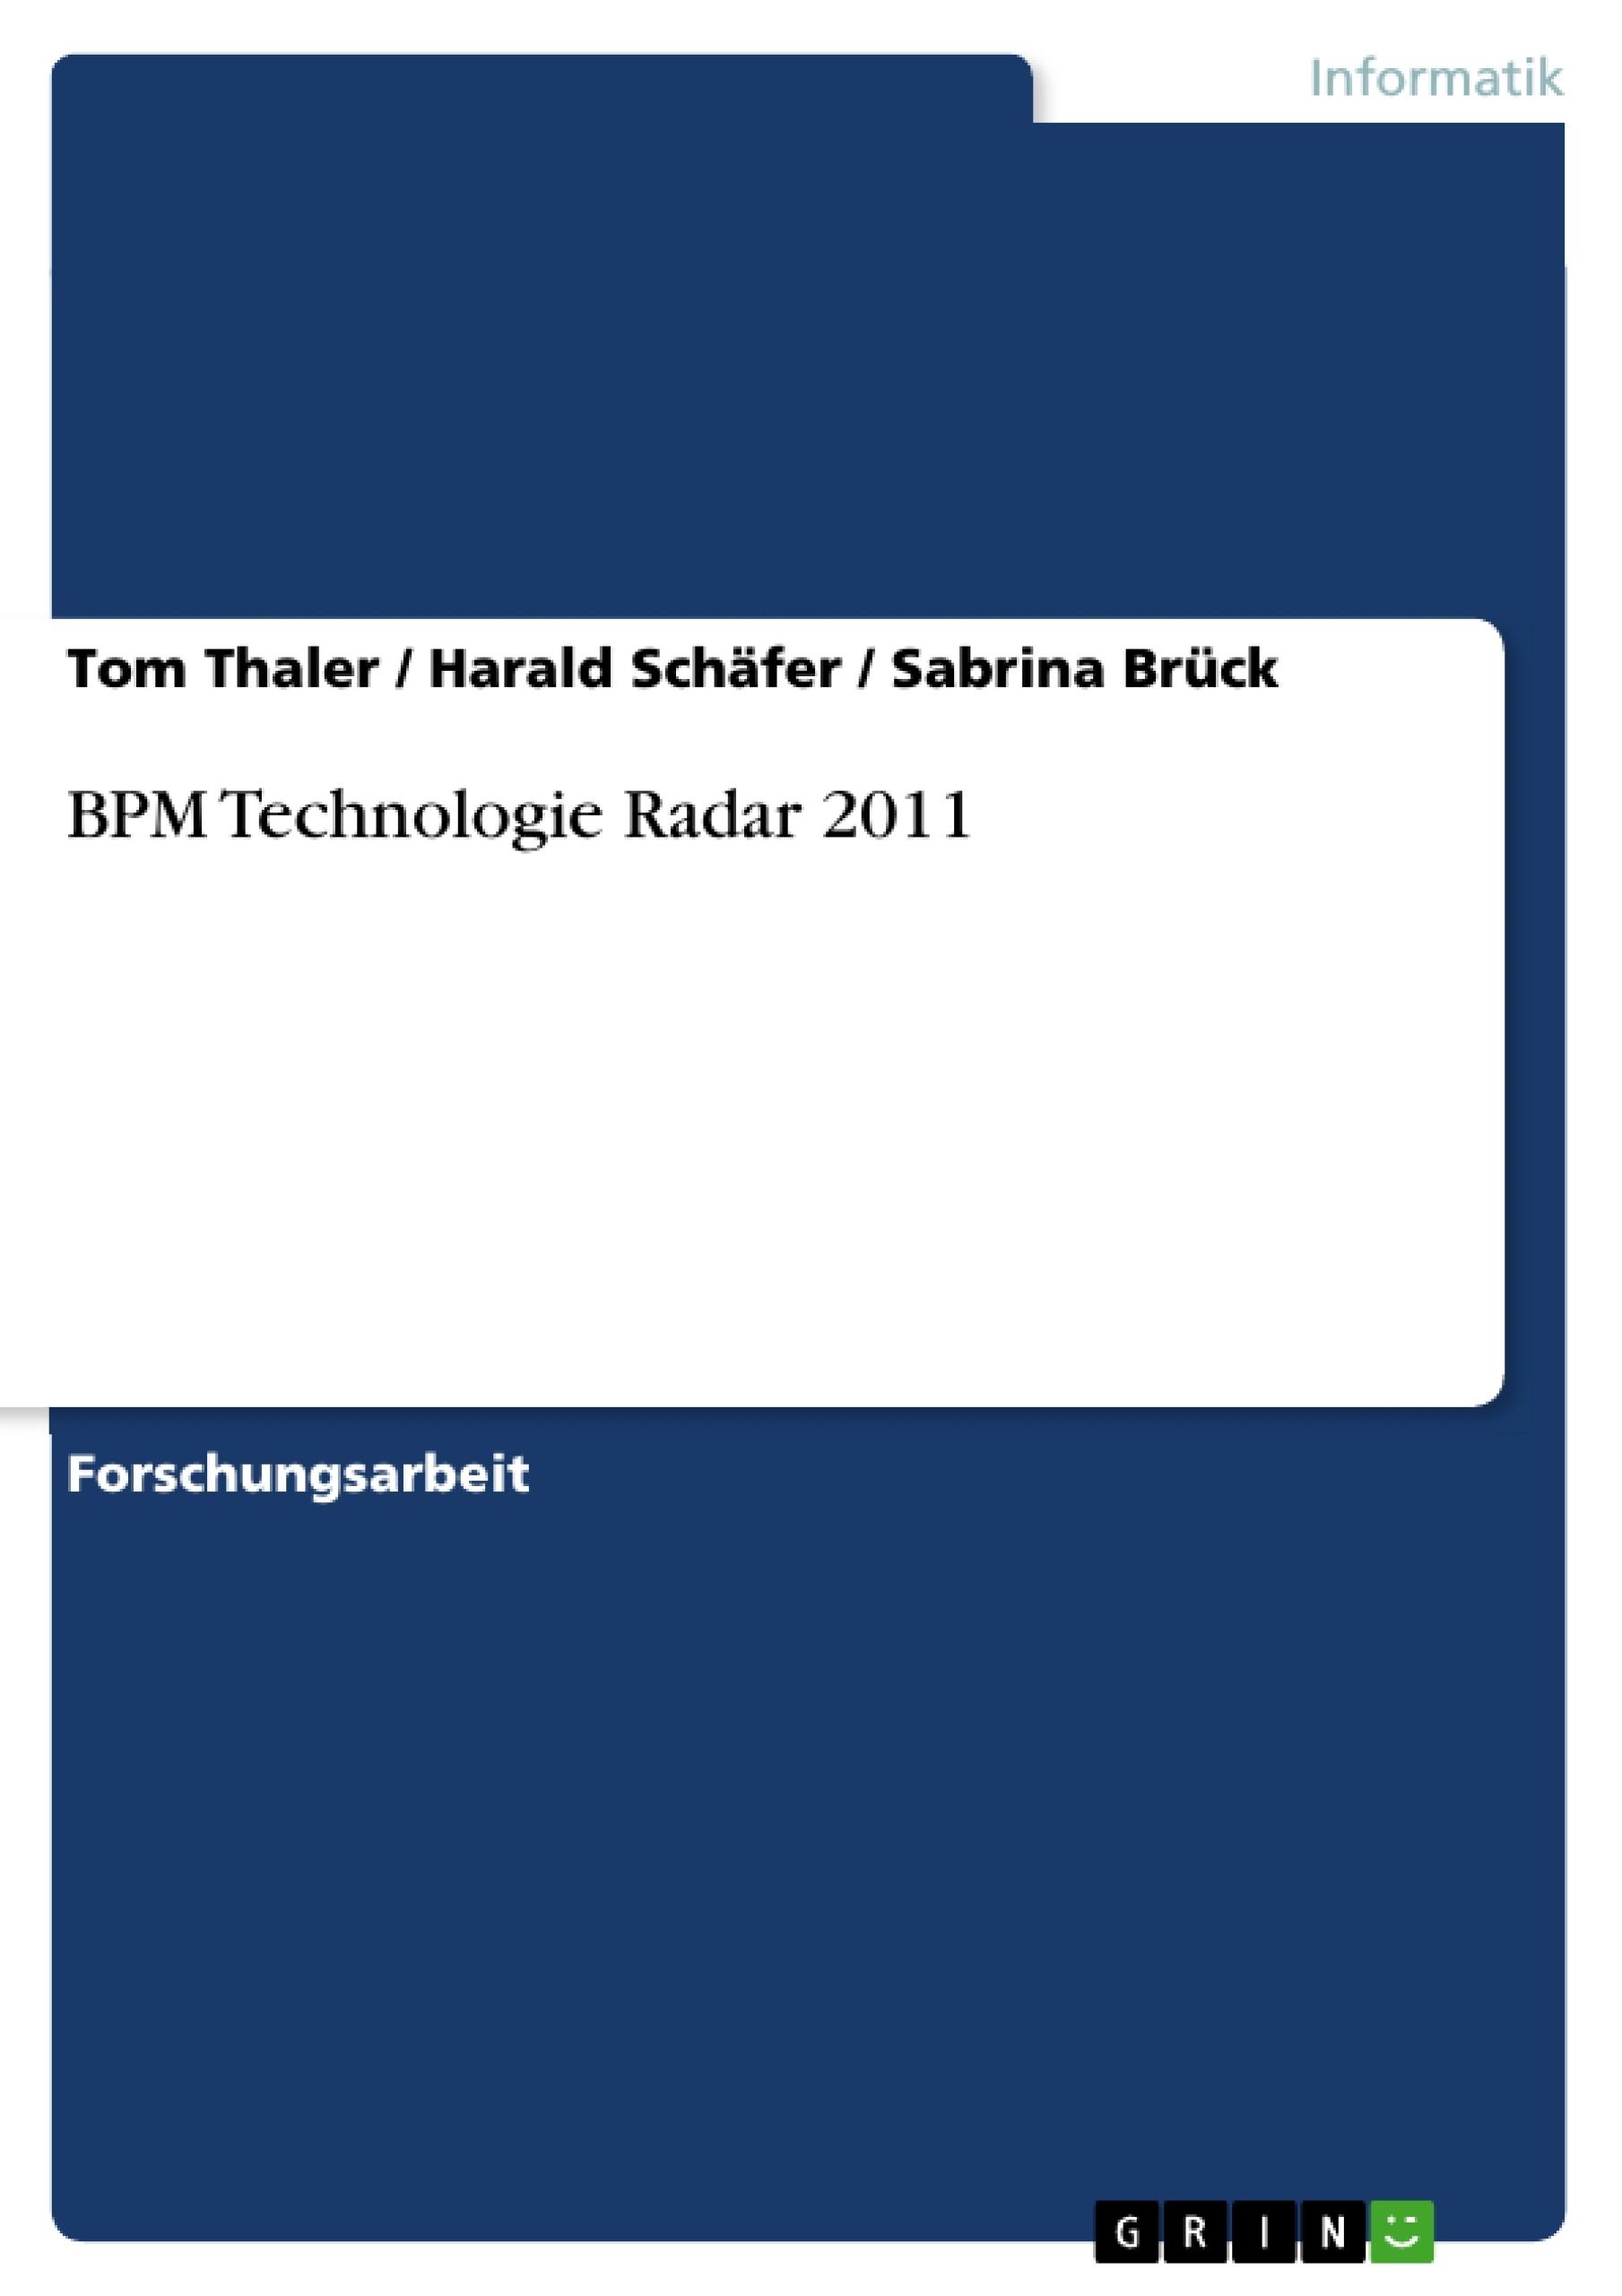 Titel: BPM Technologie Radar 2011